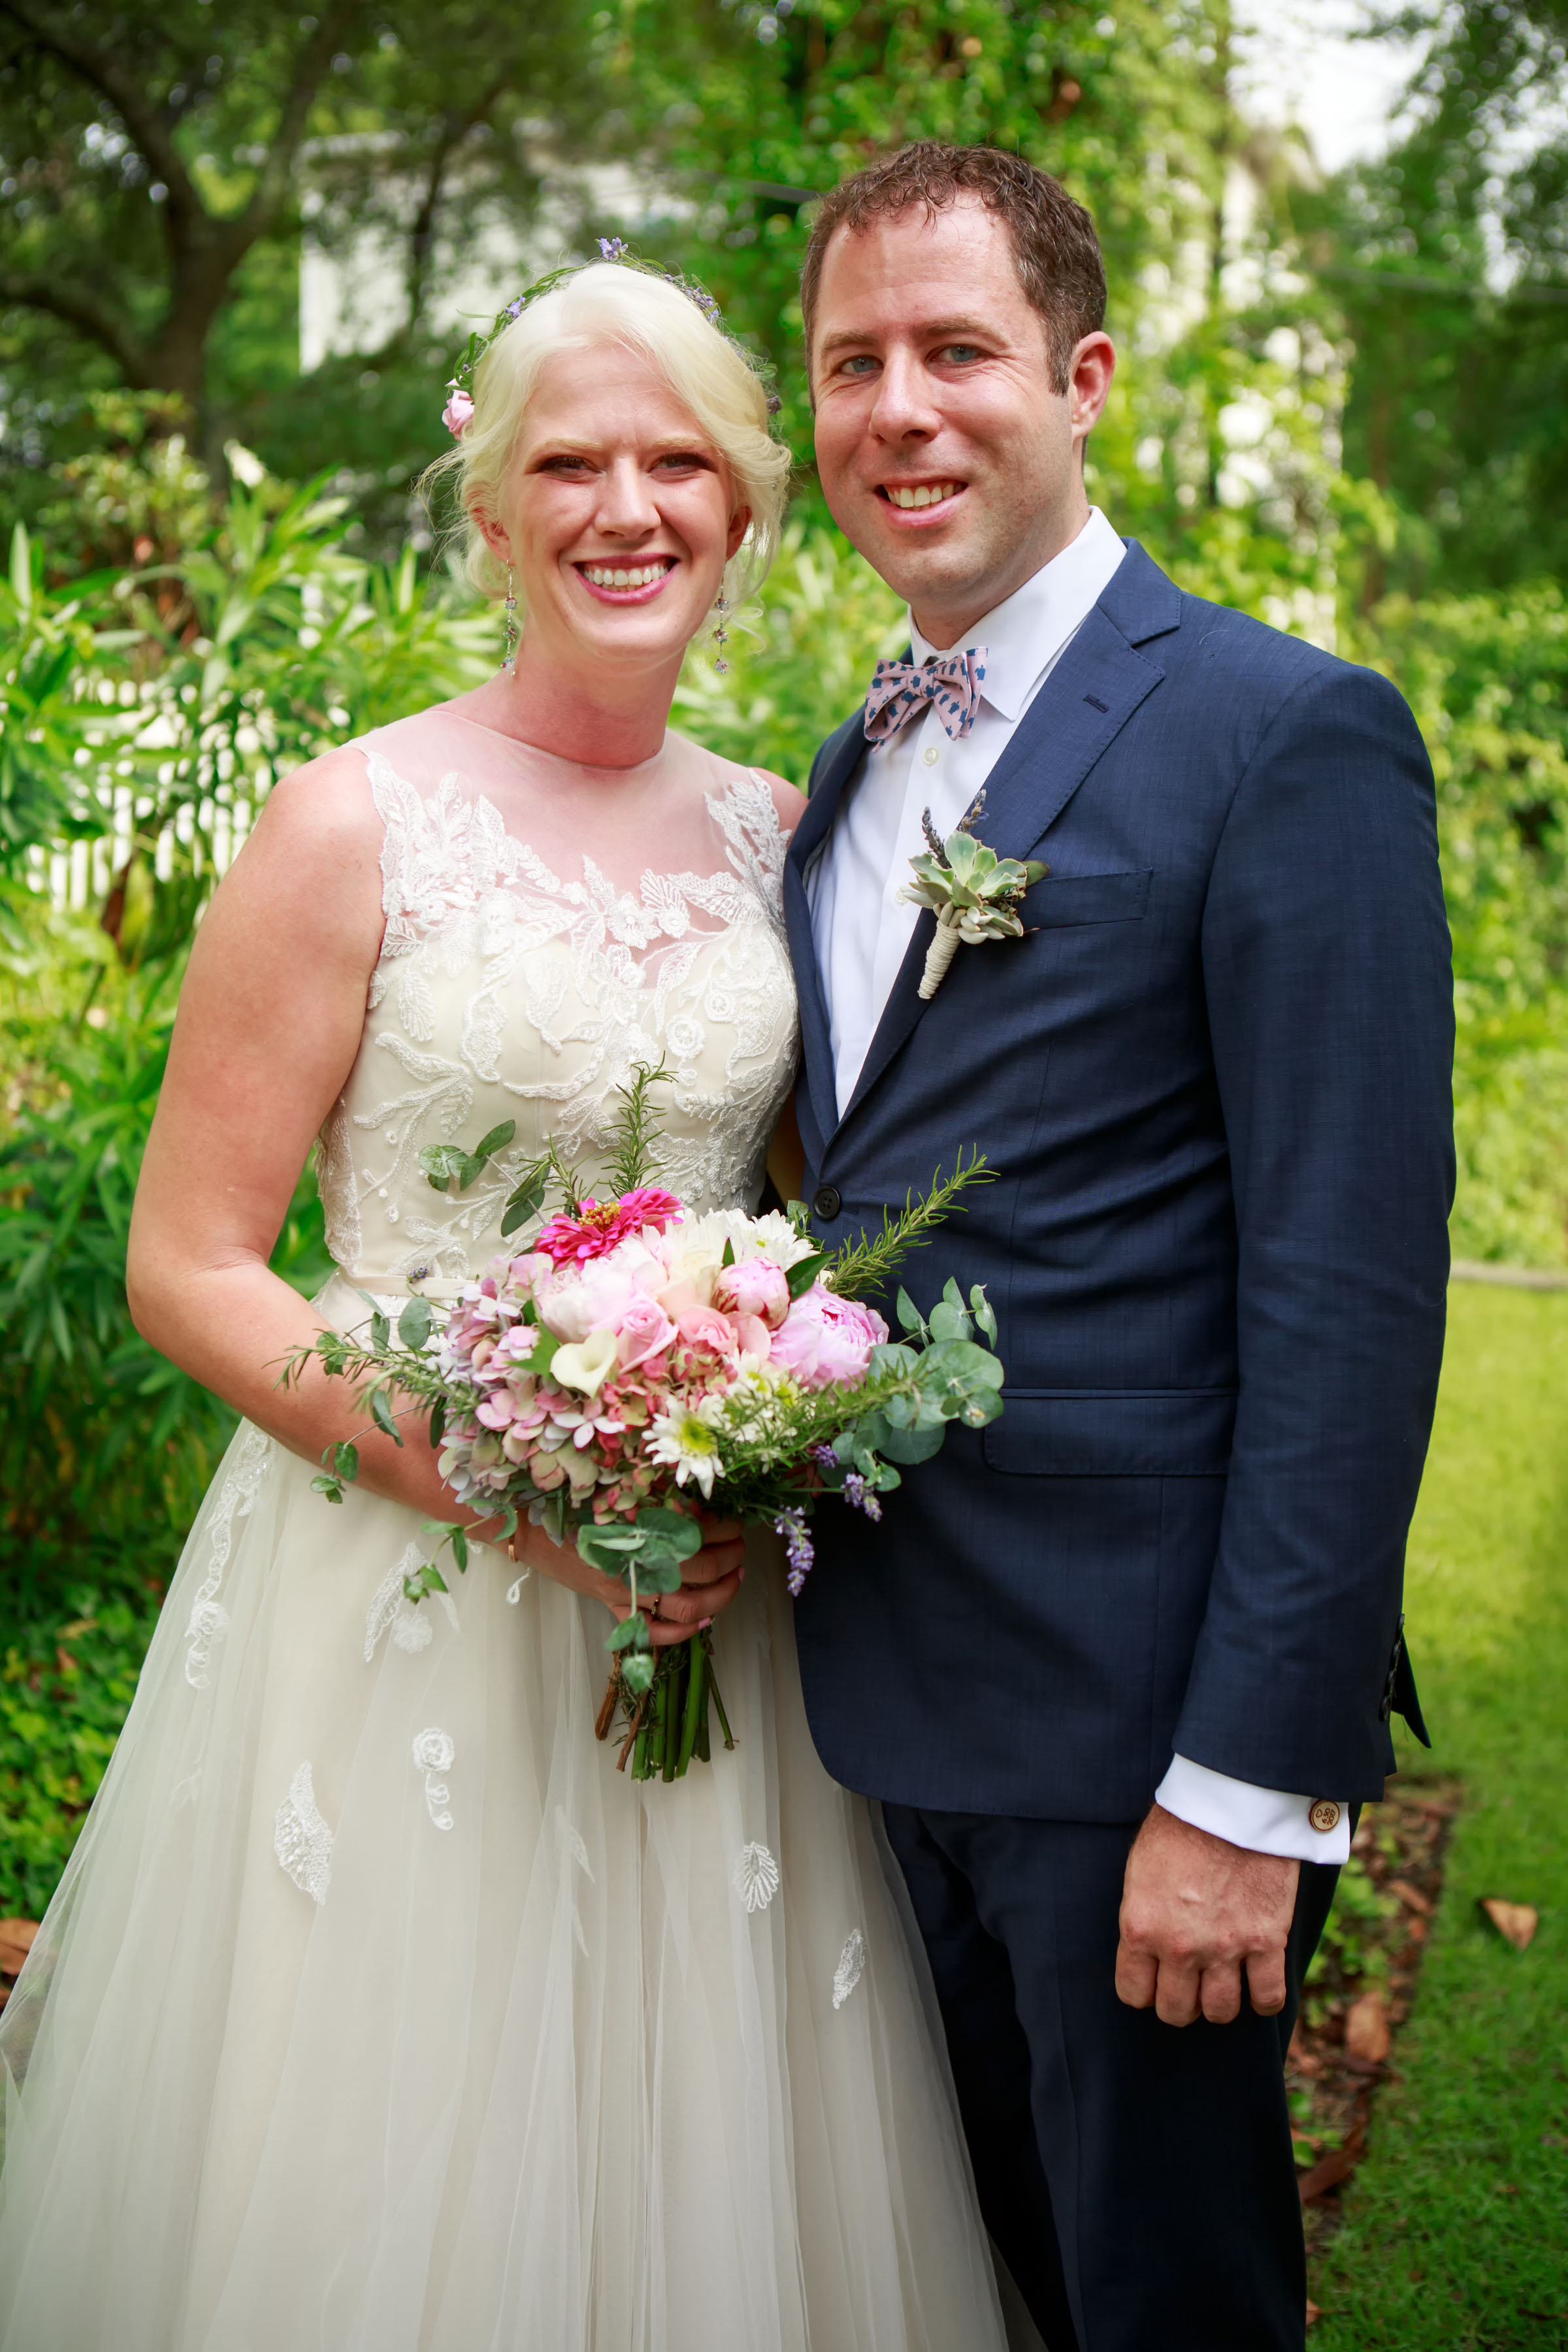 128-South-Wedding-Tiffany-Abruzzo-Photography-Bride-&-Groom-11.jpg